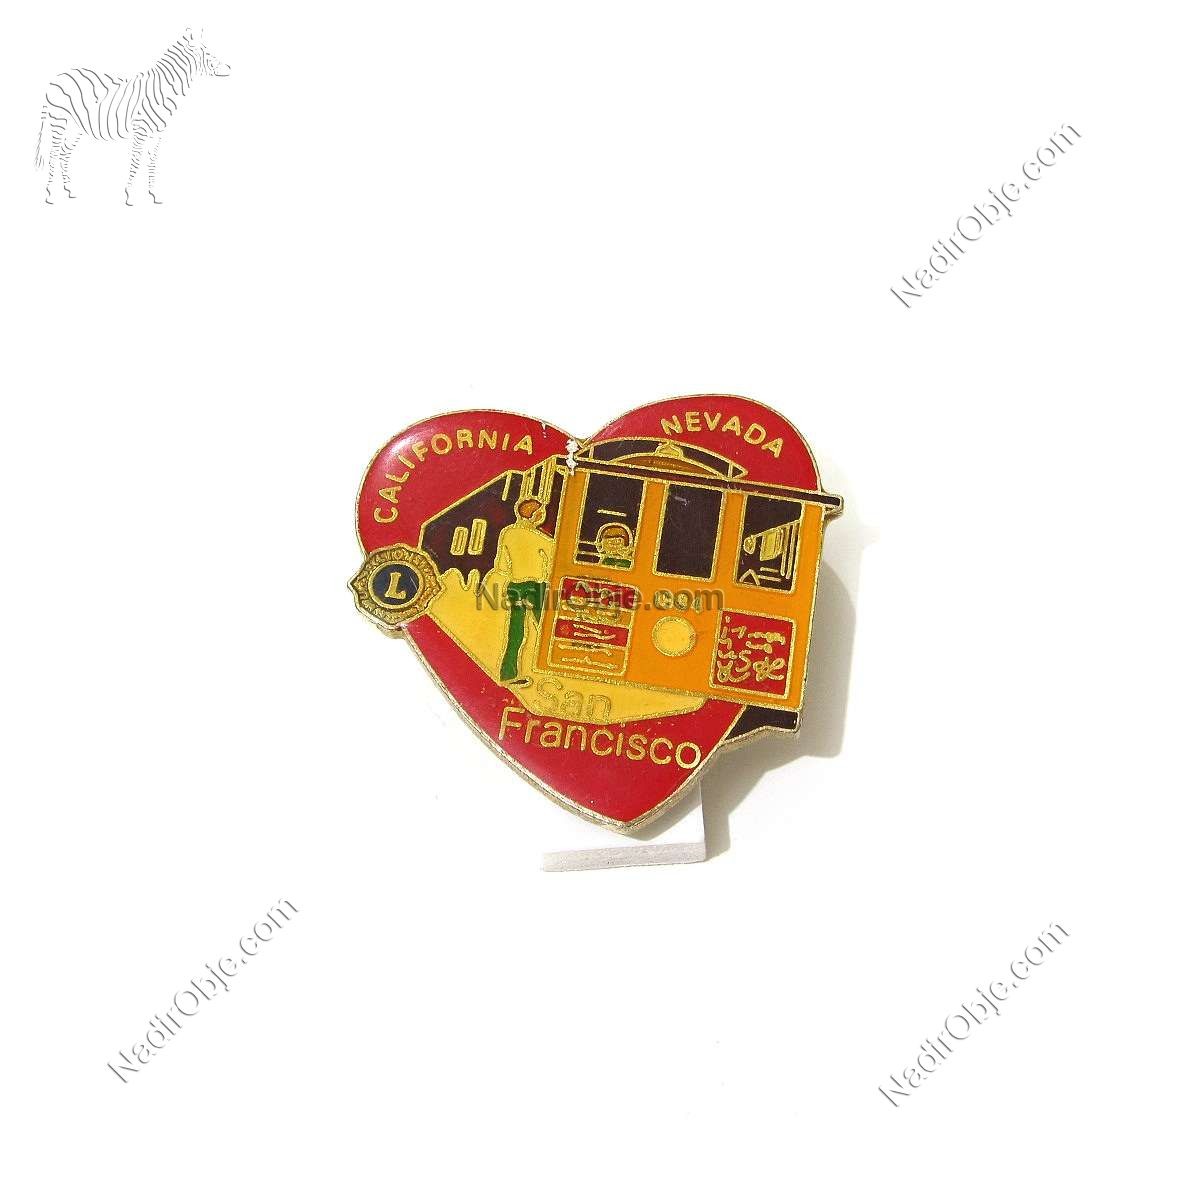 1984 Lions Rozet – N2180 Metal Objeler Lapel Badge